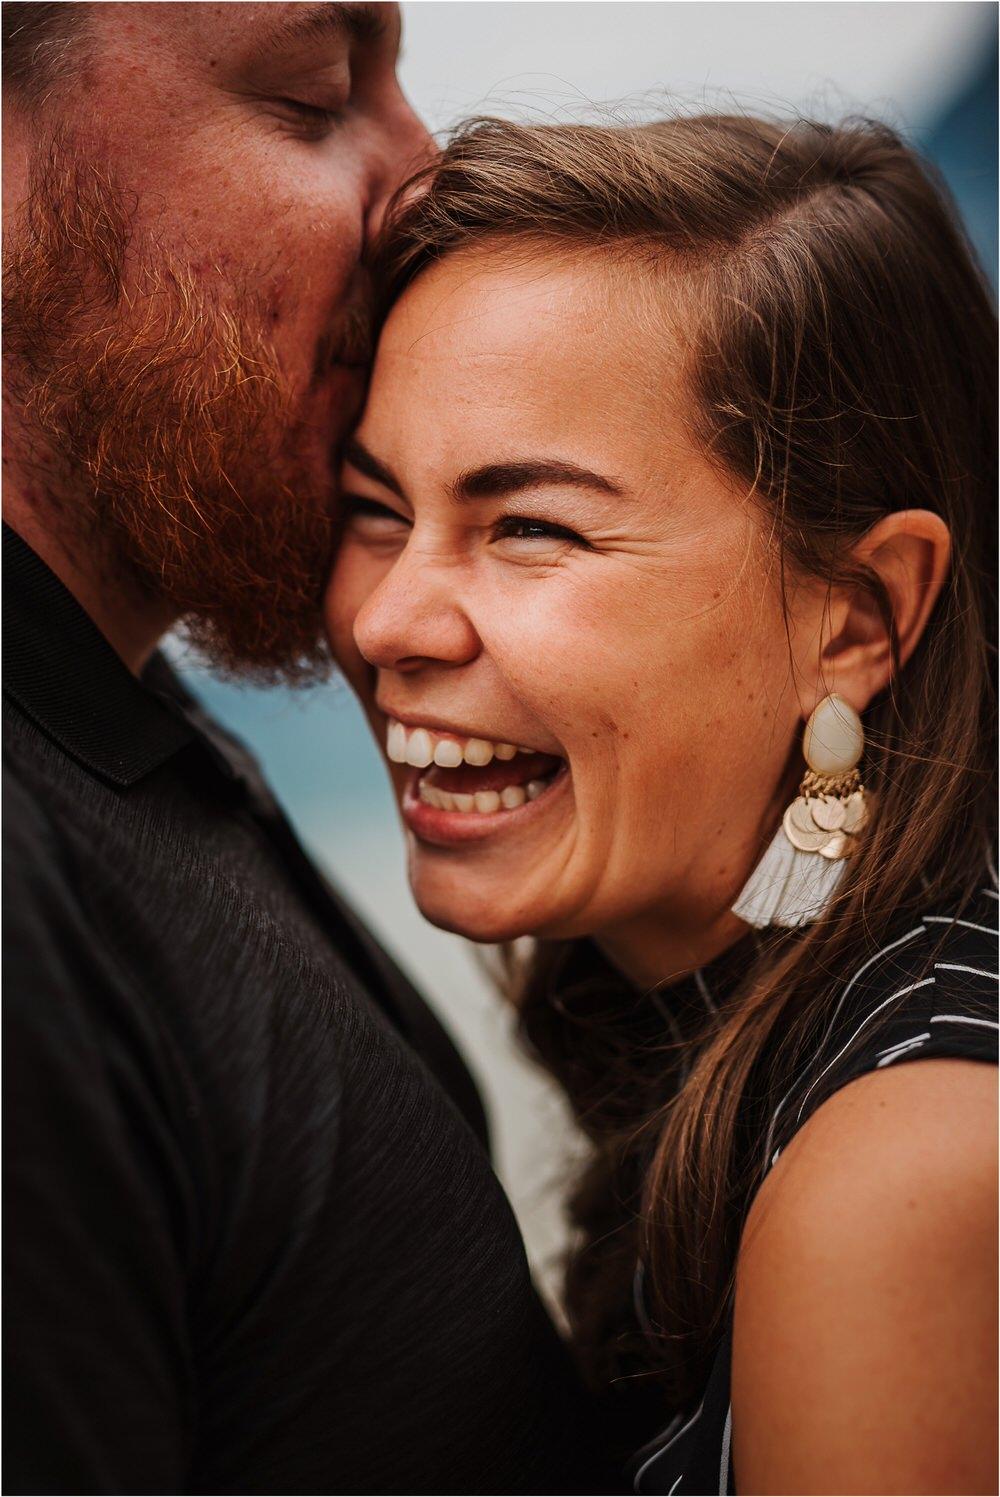 tuscany wedding photographer greece croatia dubrovnik vjencanje hochzeit wedding photography photos romantic engagement nika grega 0110.jpg